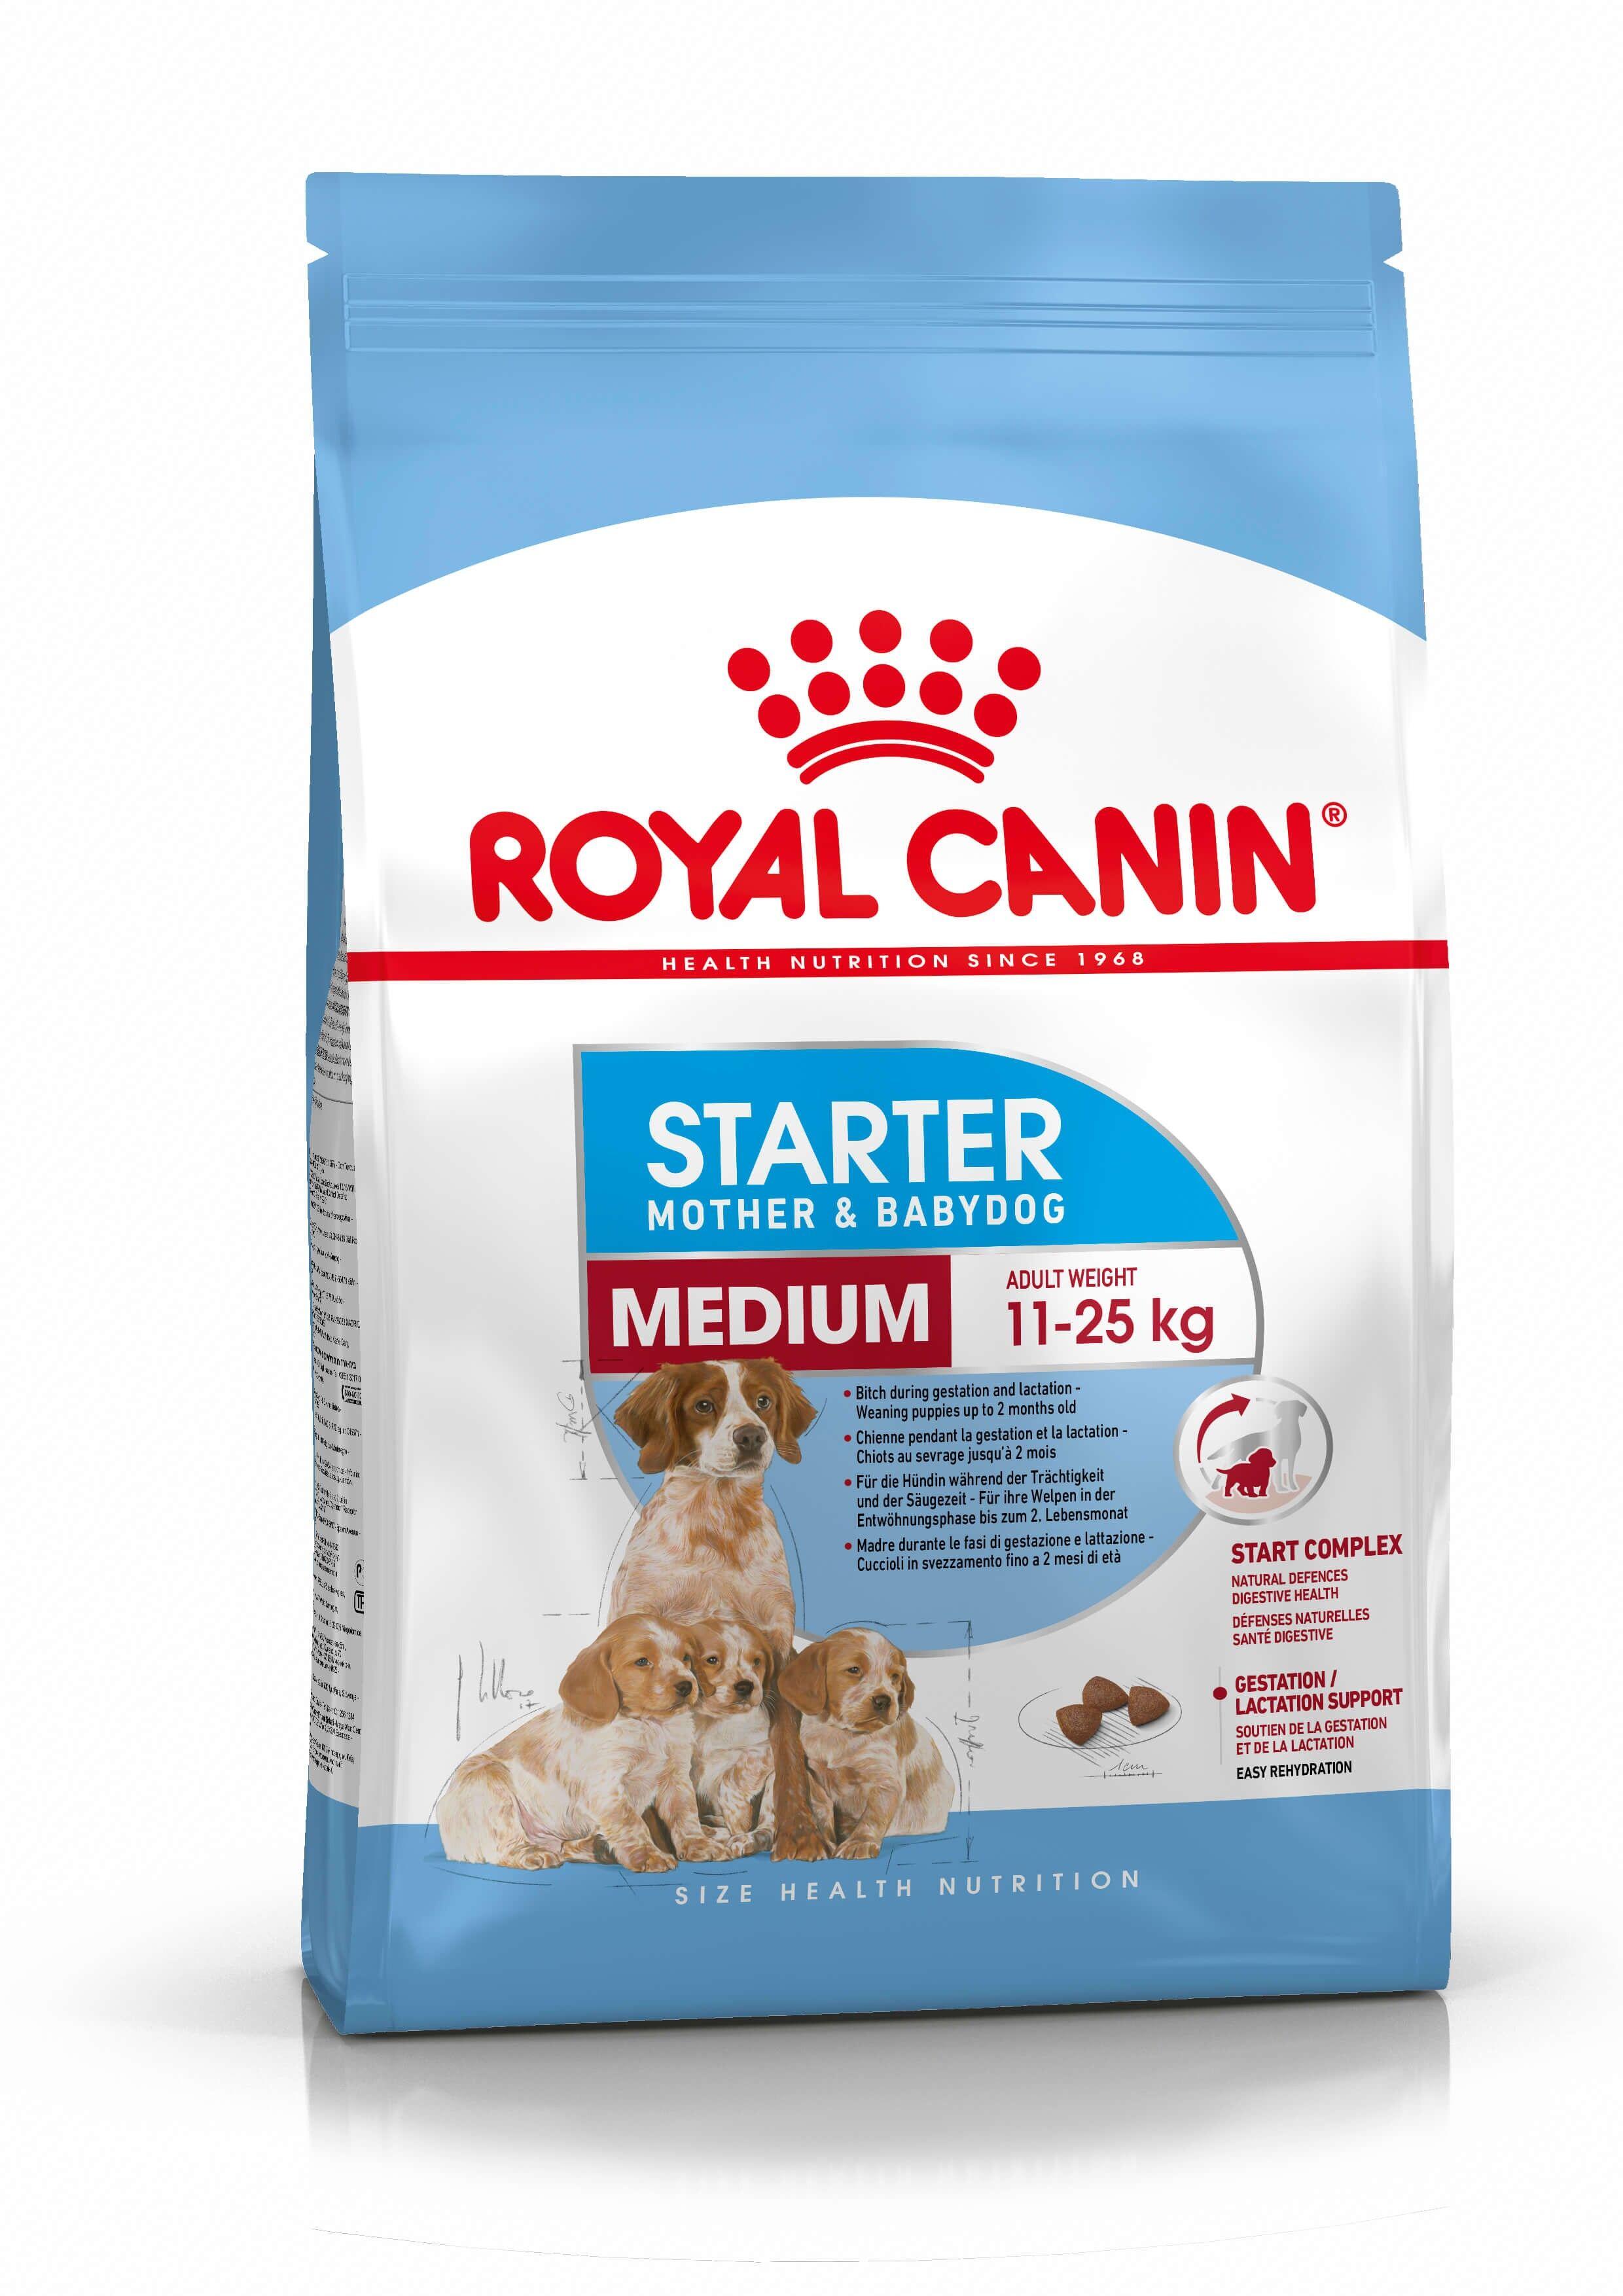 Royal Canin Size Health Nutrition Royal Canin Medium Starter Mother and Babydog 12 kg